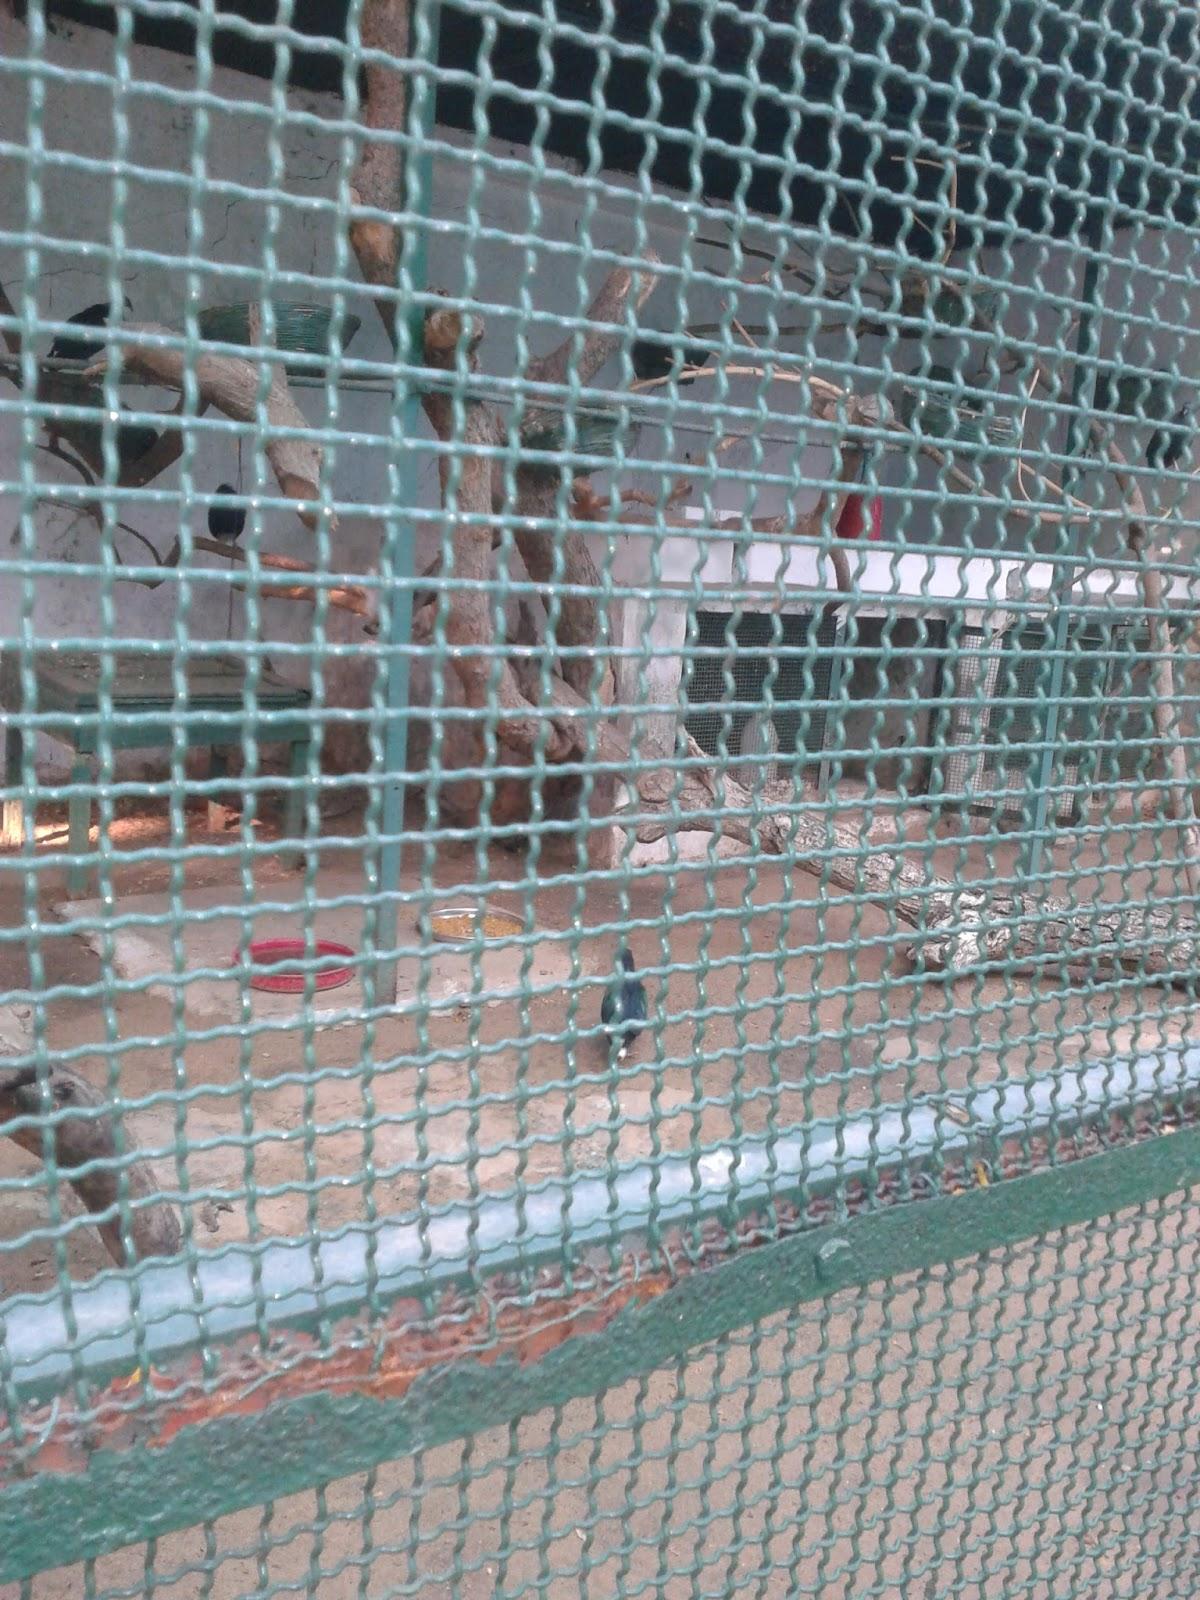 pigeon cage setup